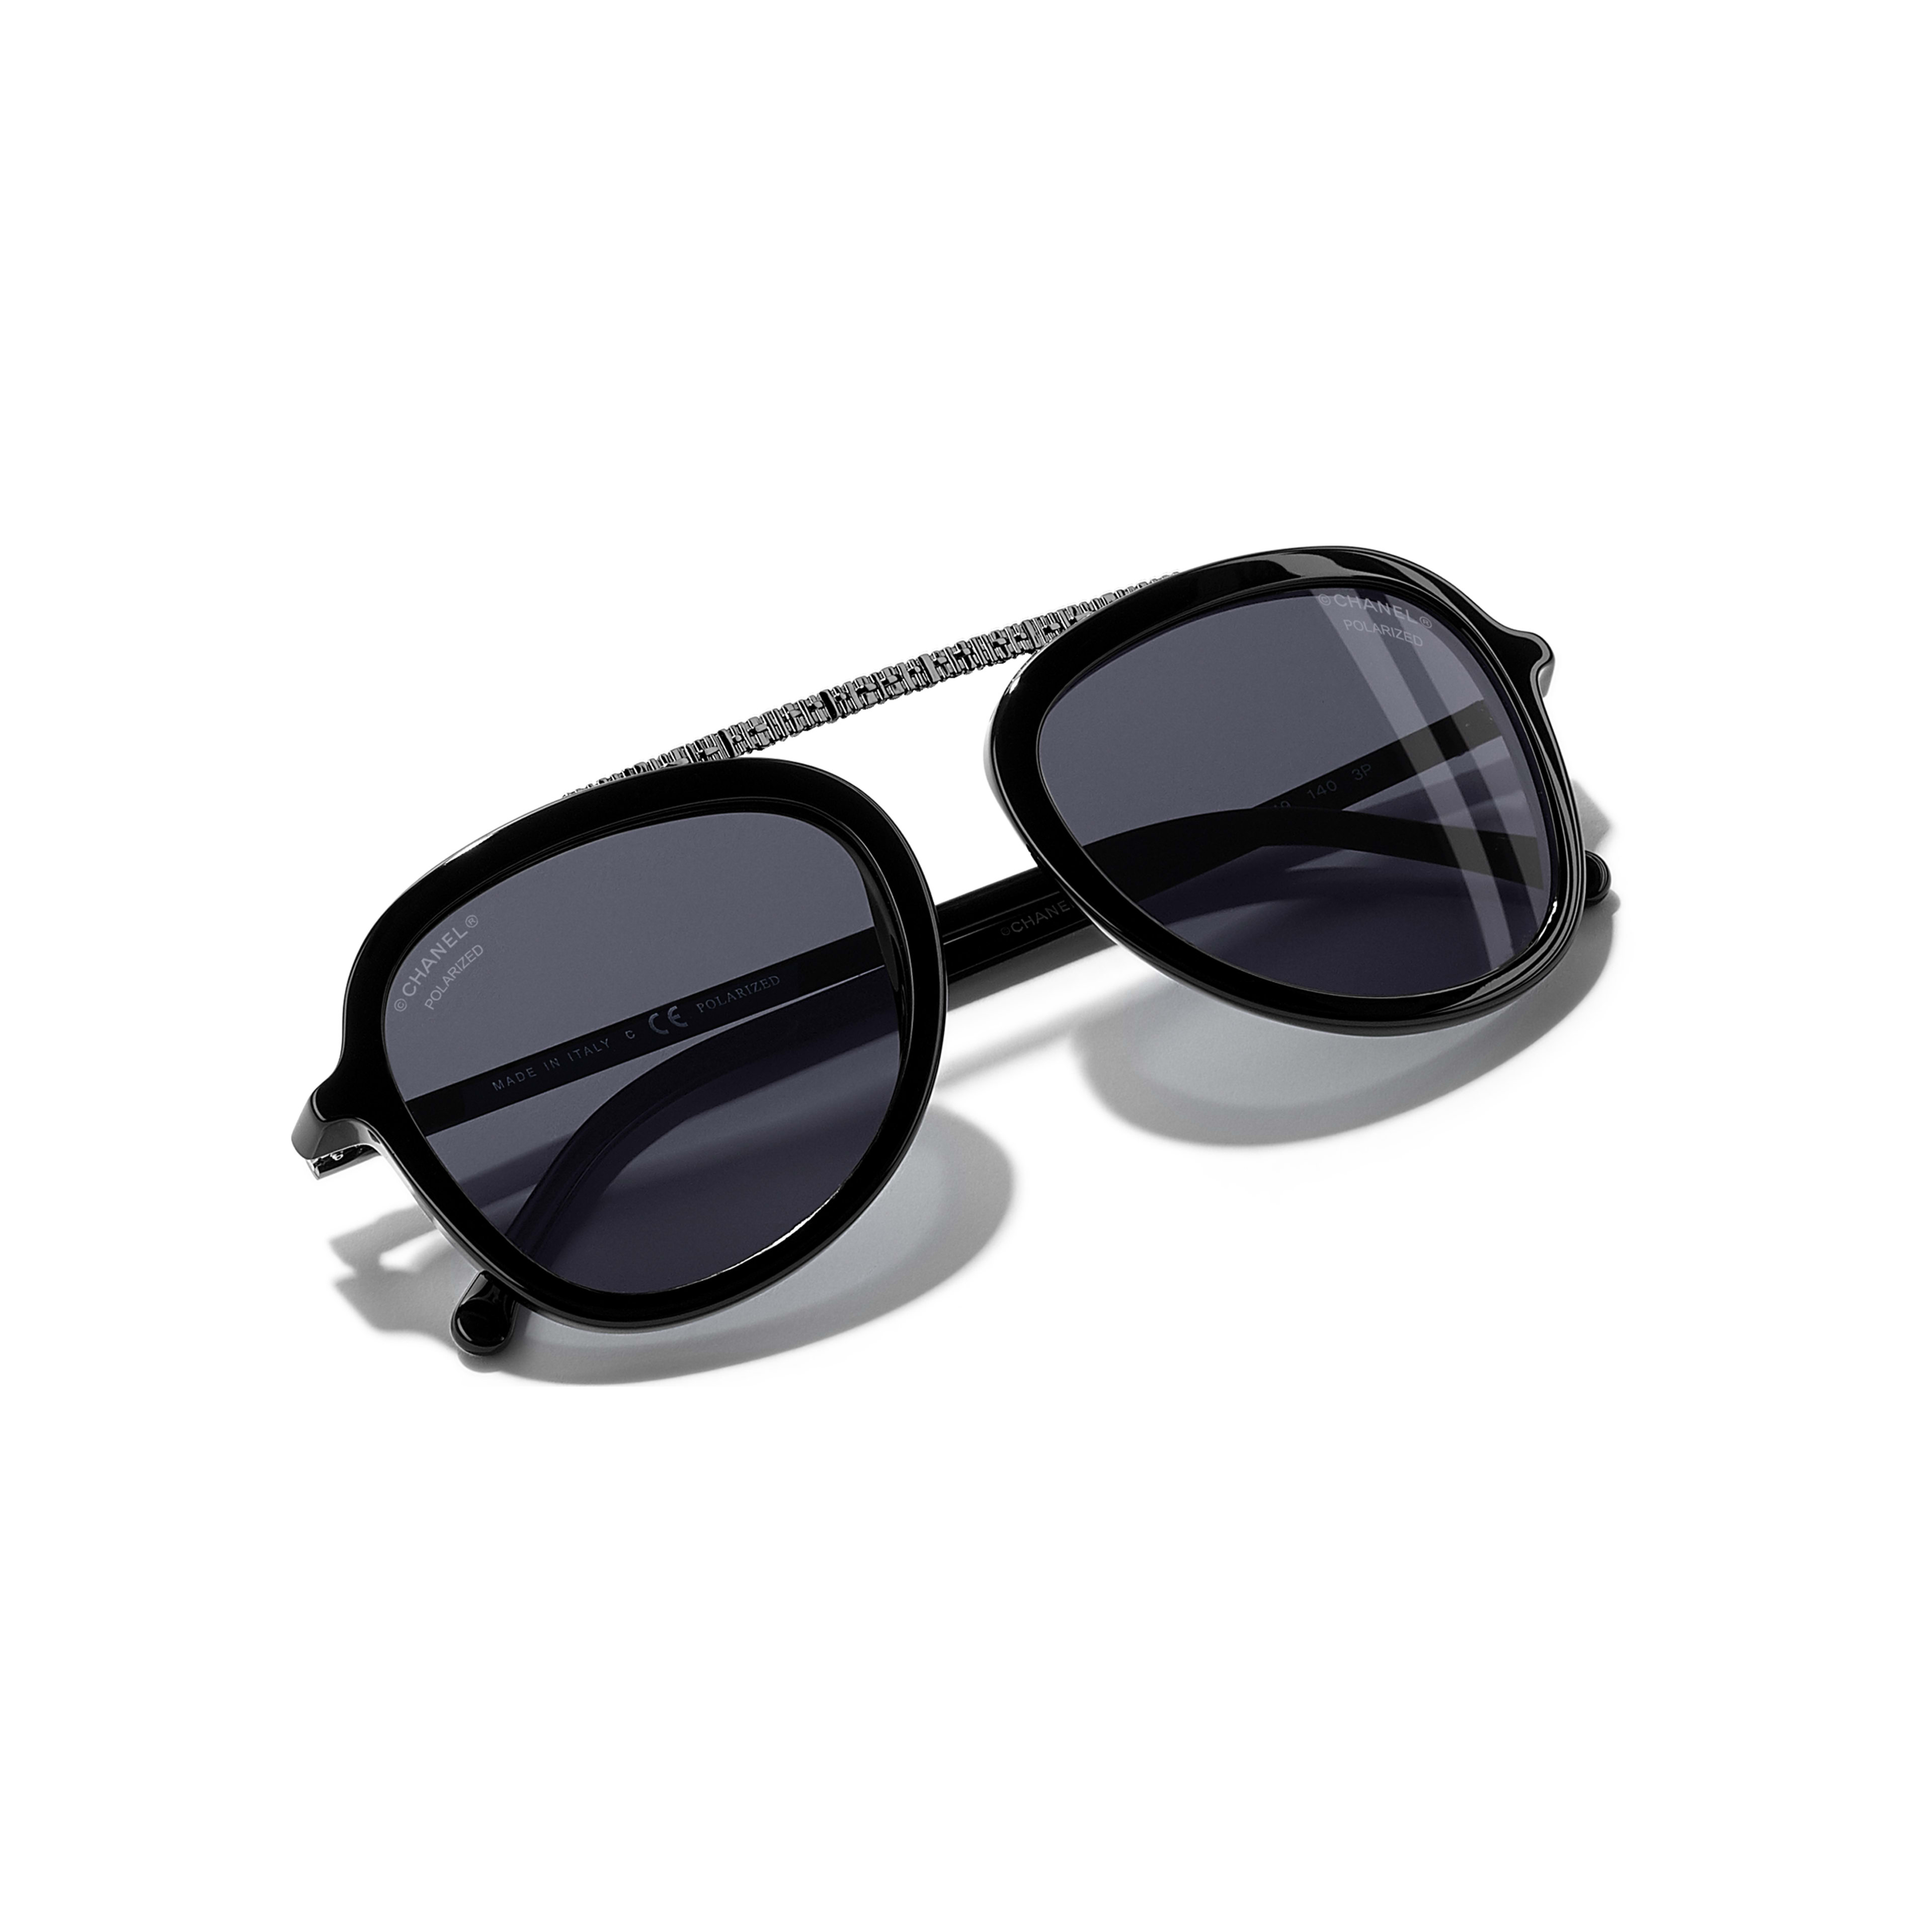 Pilot Sunglasses Acetate - Polarized Lenses Black -                                                               view 1 - see full sized version